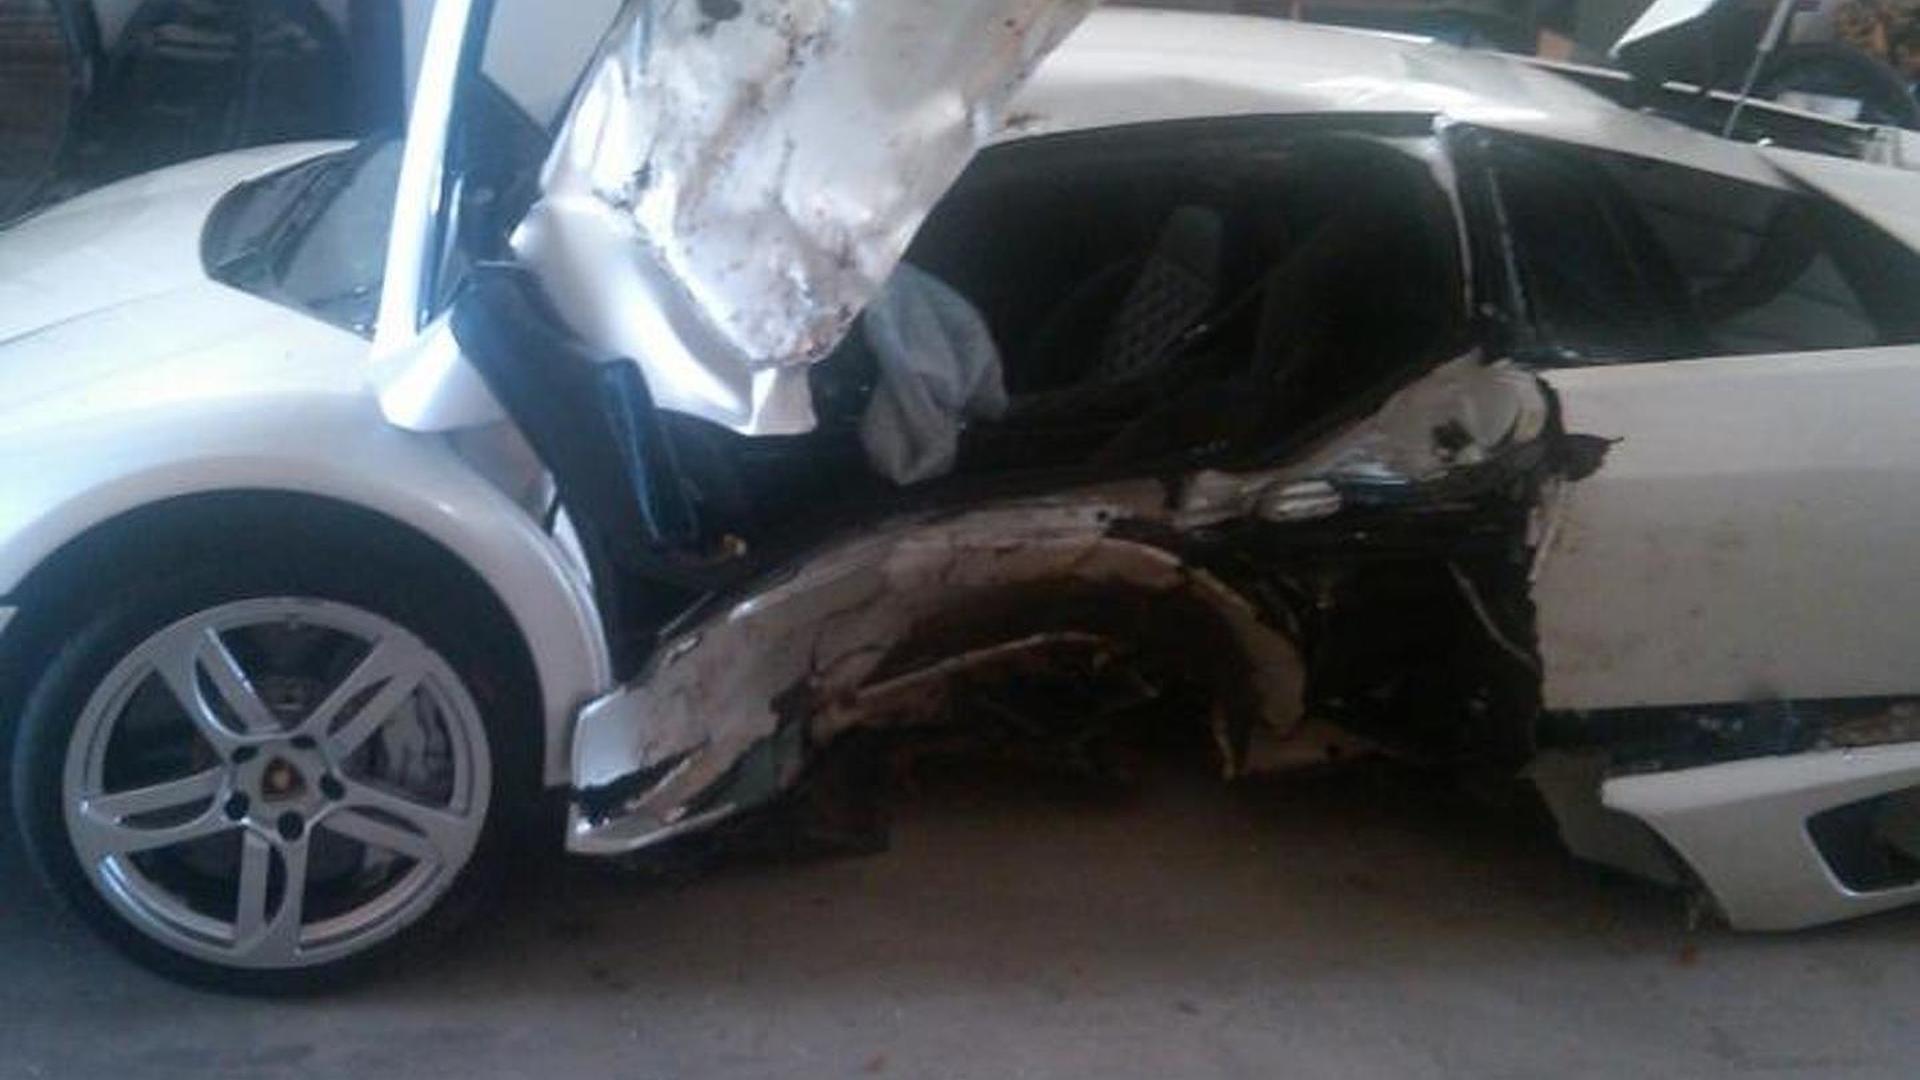 Lamborghini Murcielago Joyride Ends With A Tree Crash Two Injured